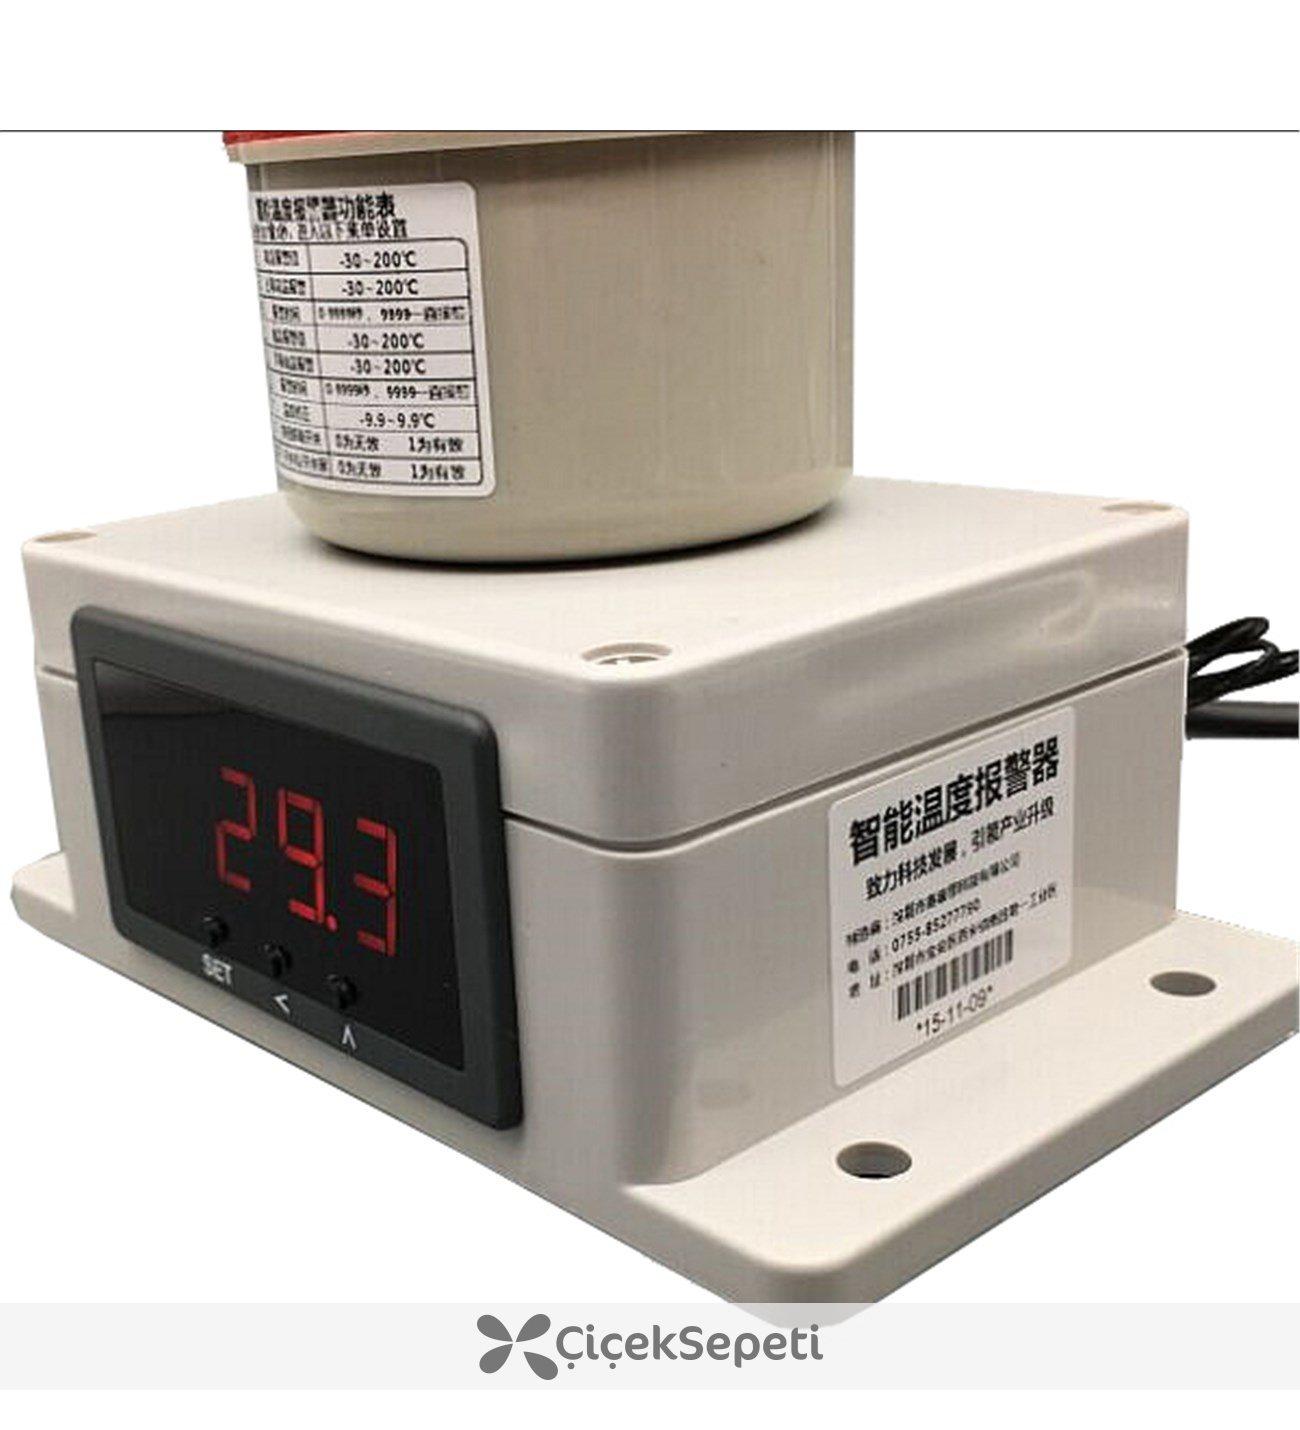 Ik Ve Ses Alarml Termometre 30 Le 200 Derece Aras Thr265 1